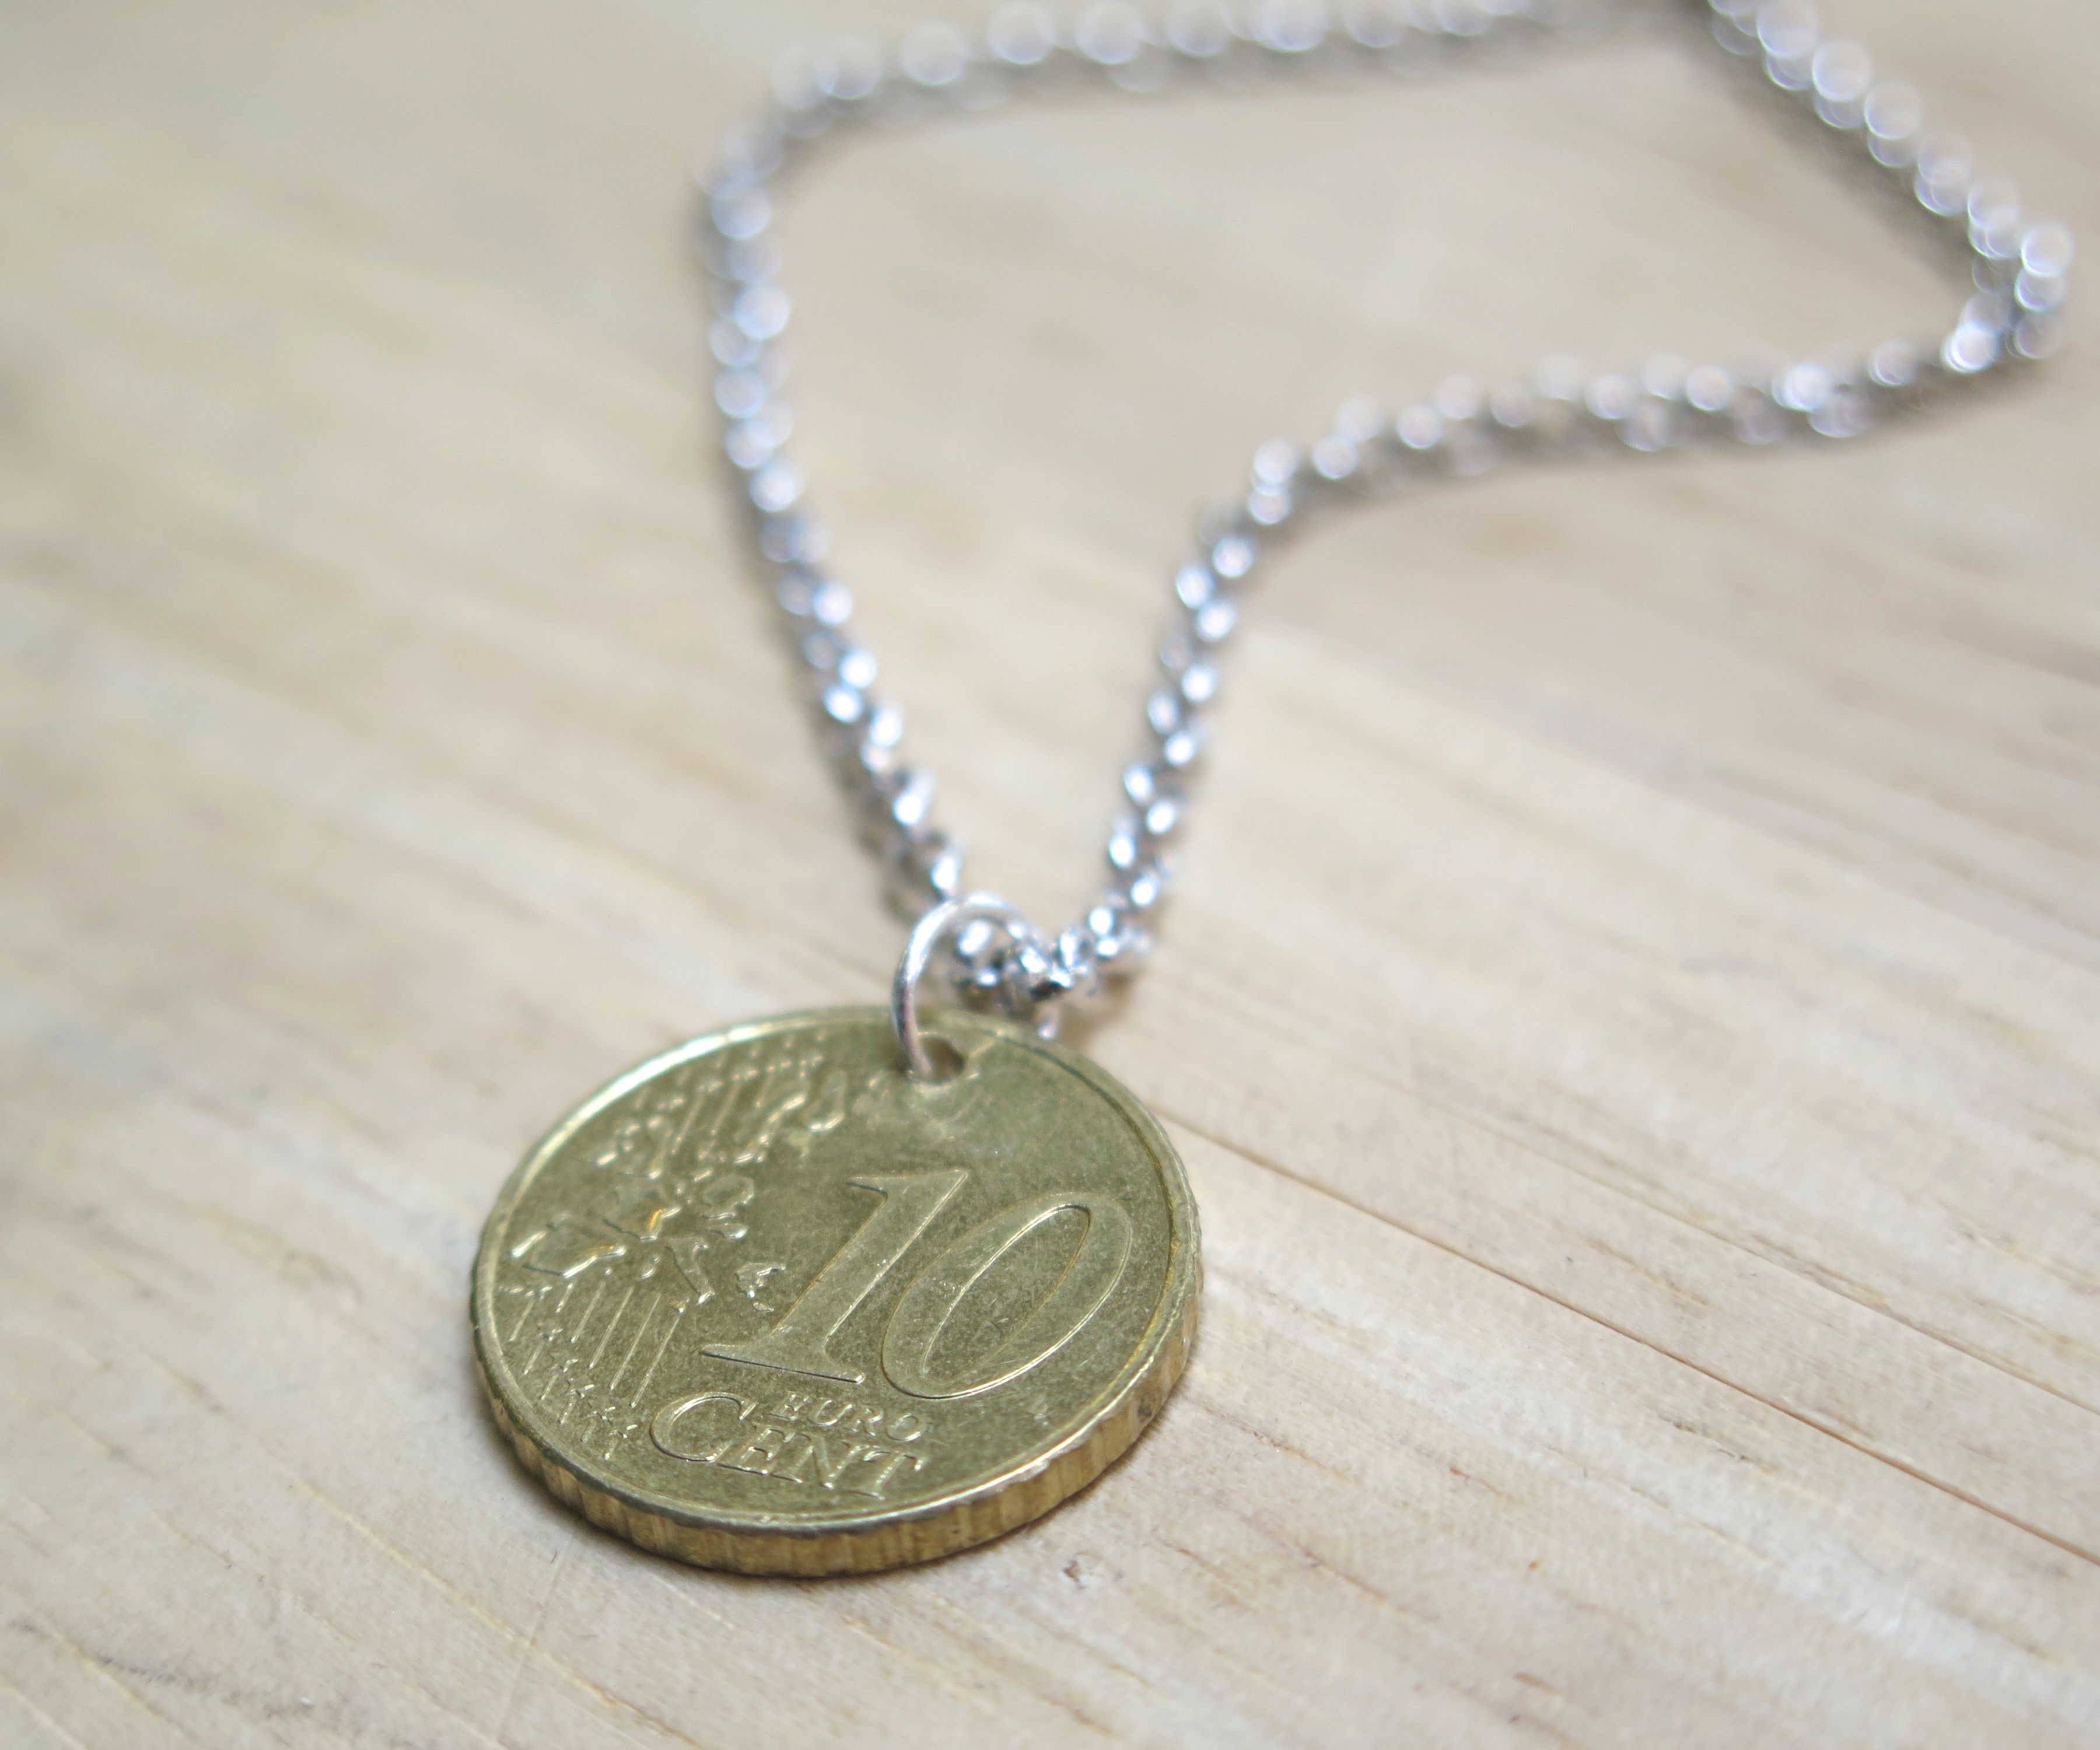 How to make a coin into a pendant